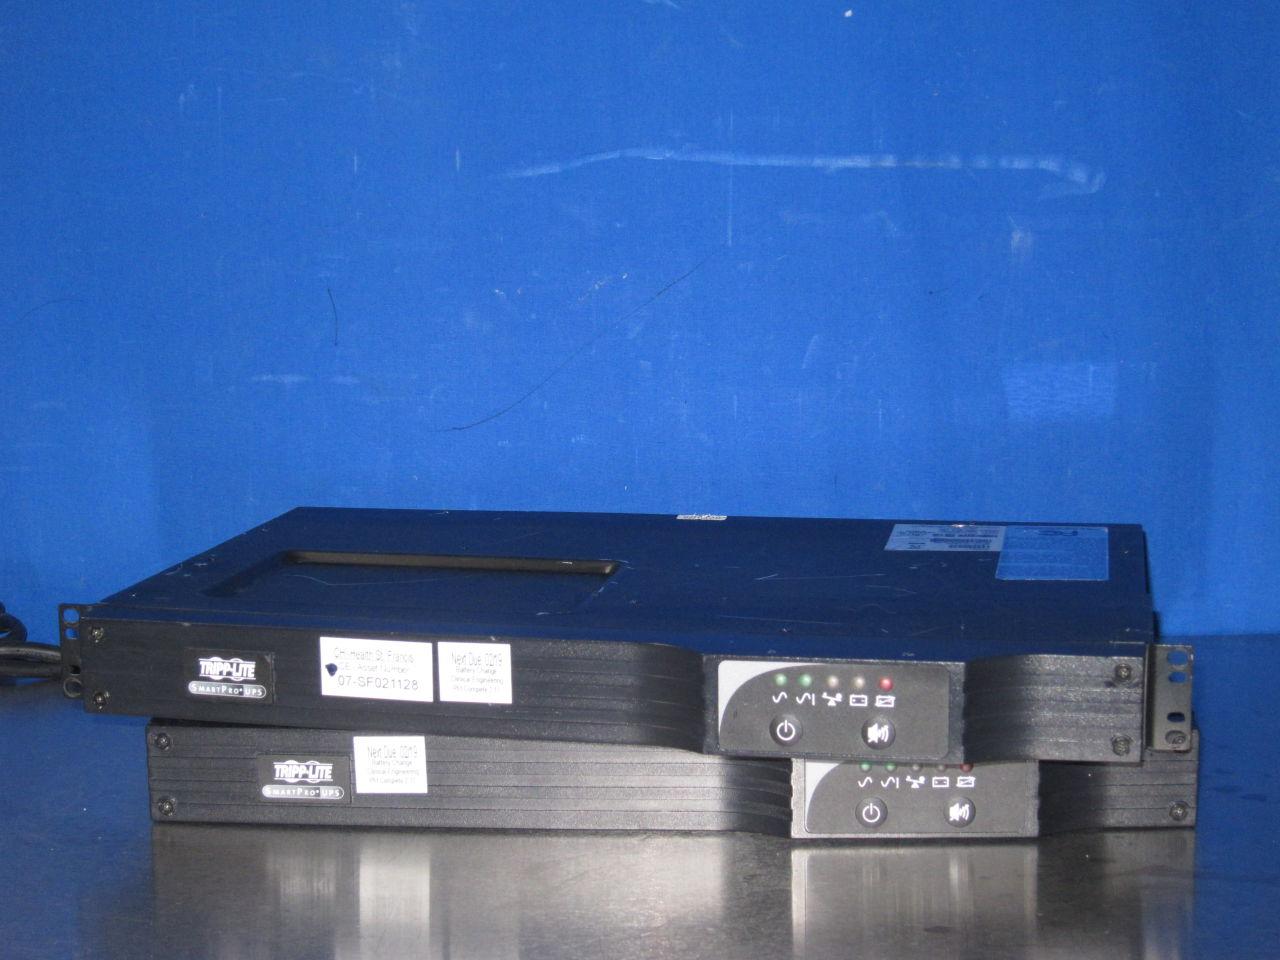 TRIPP-LITE Smart500RT1U  - Lot of 2 Uninterruptible Power Supply / UPS